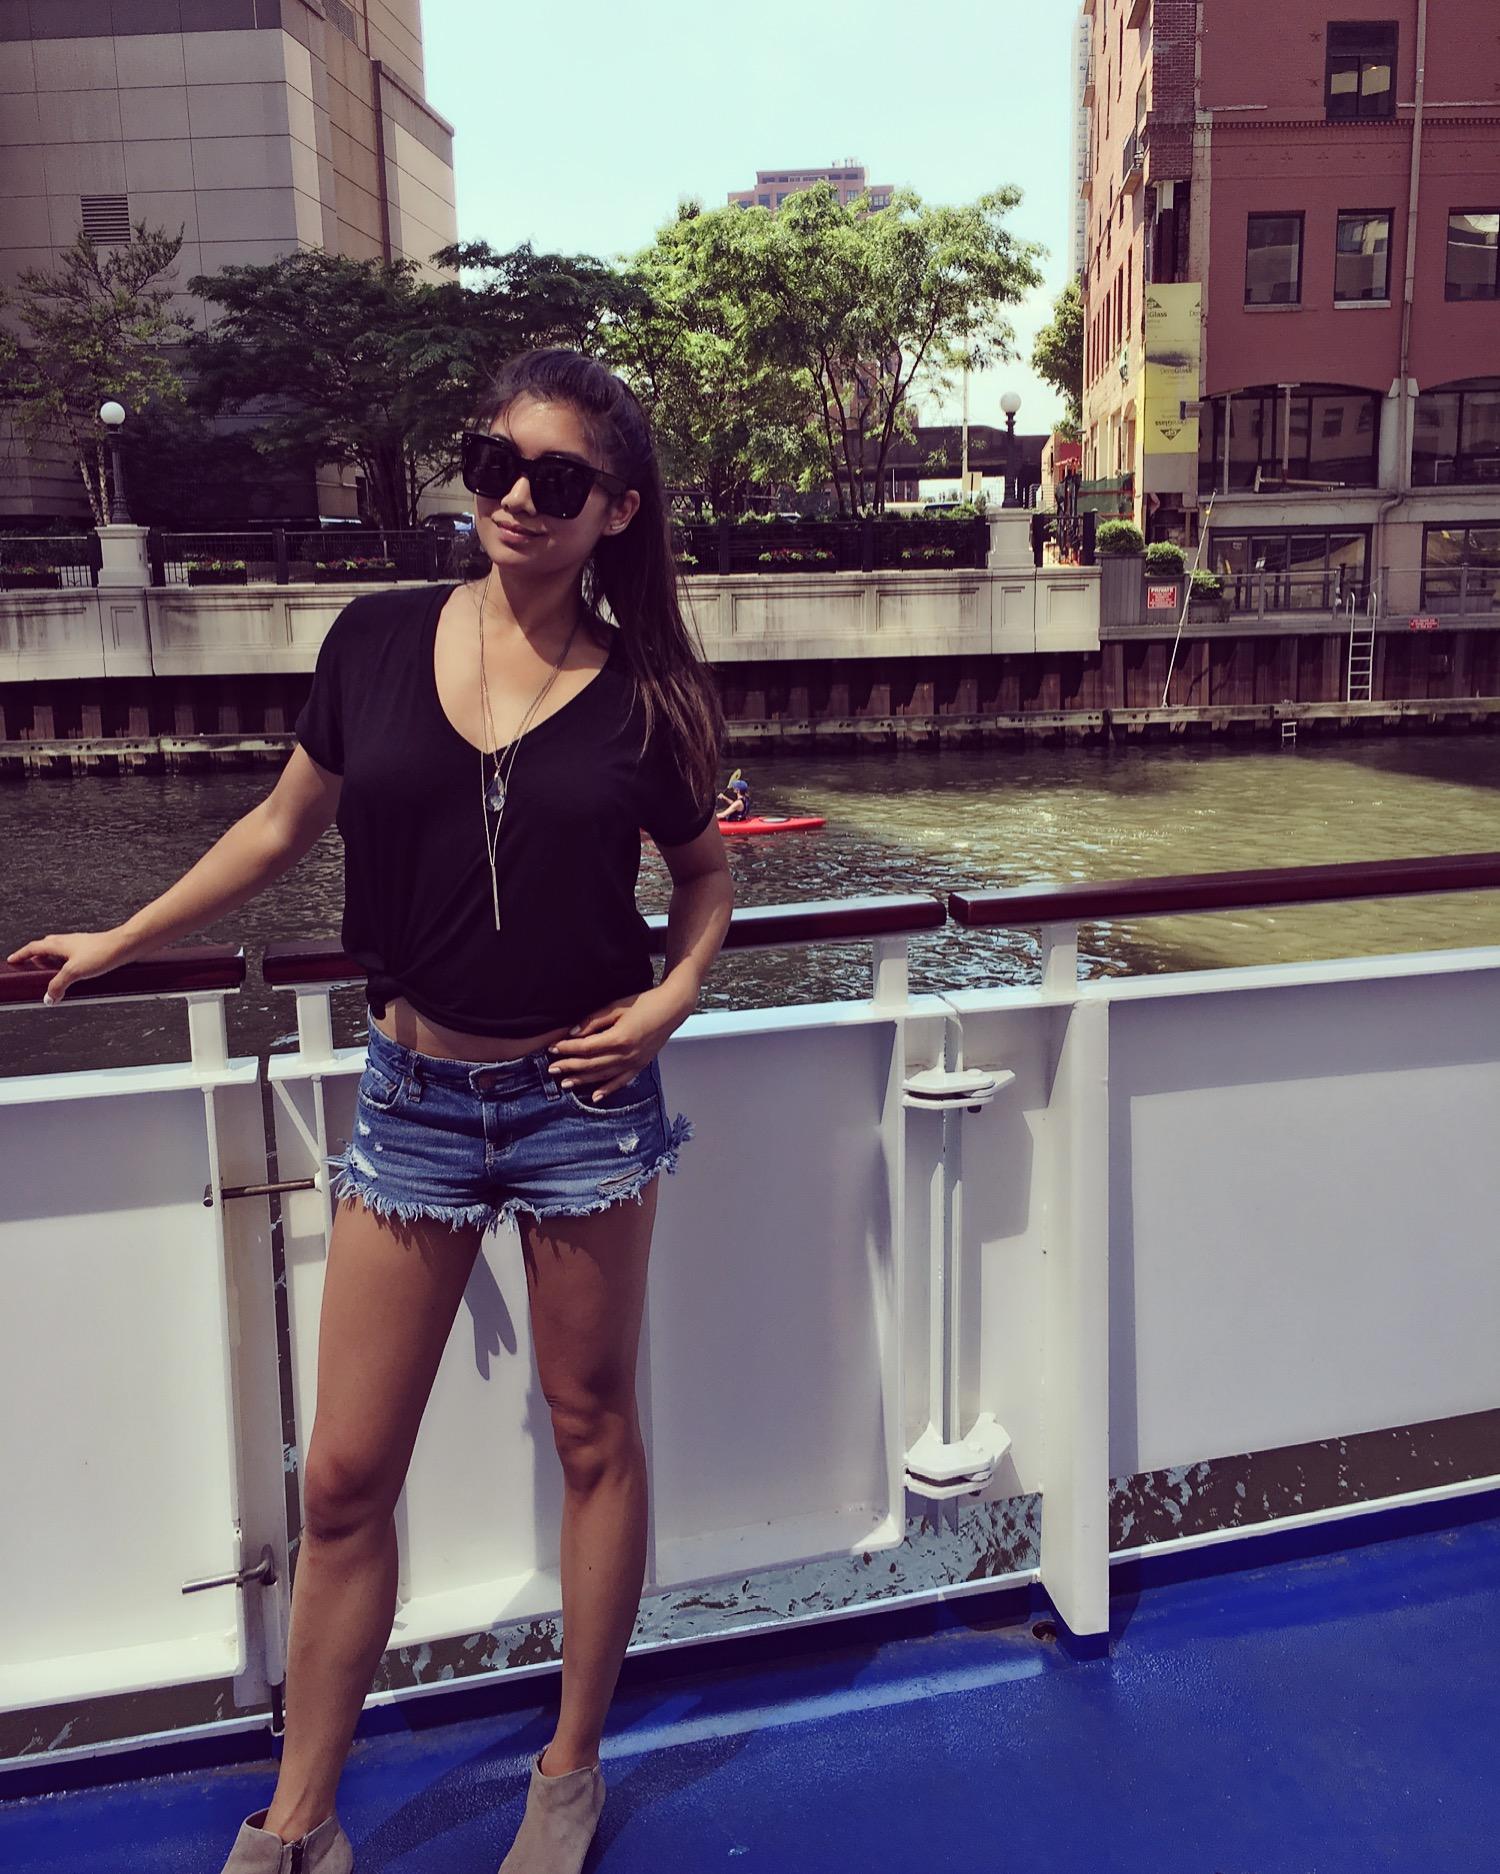 Chicago_boat.jpeg